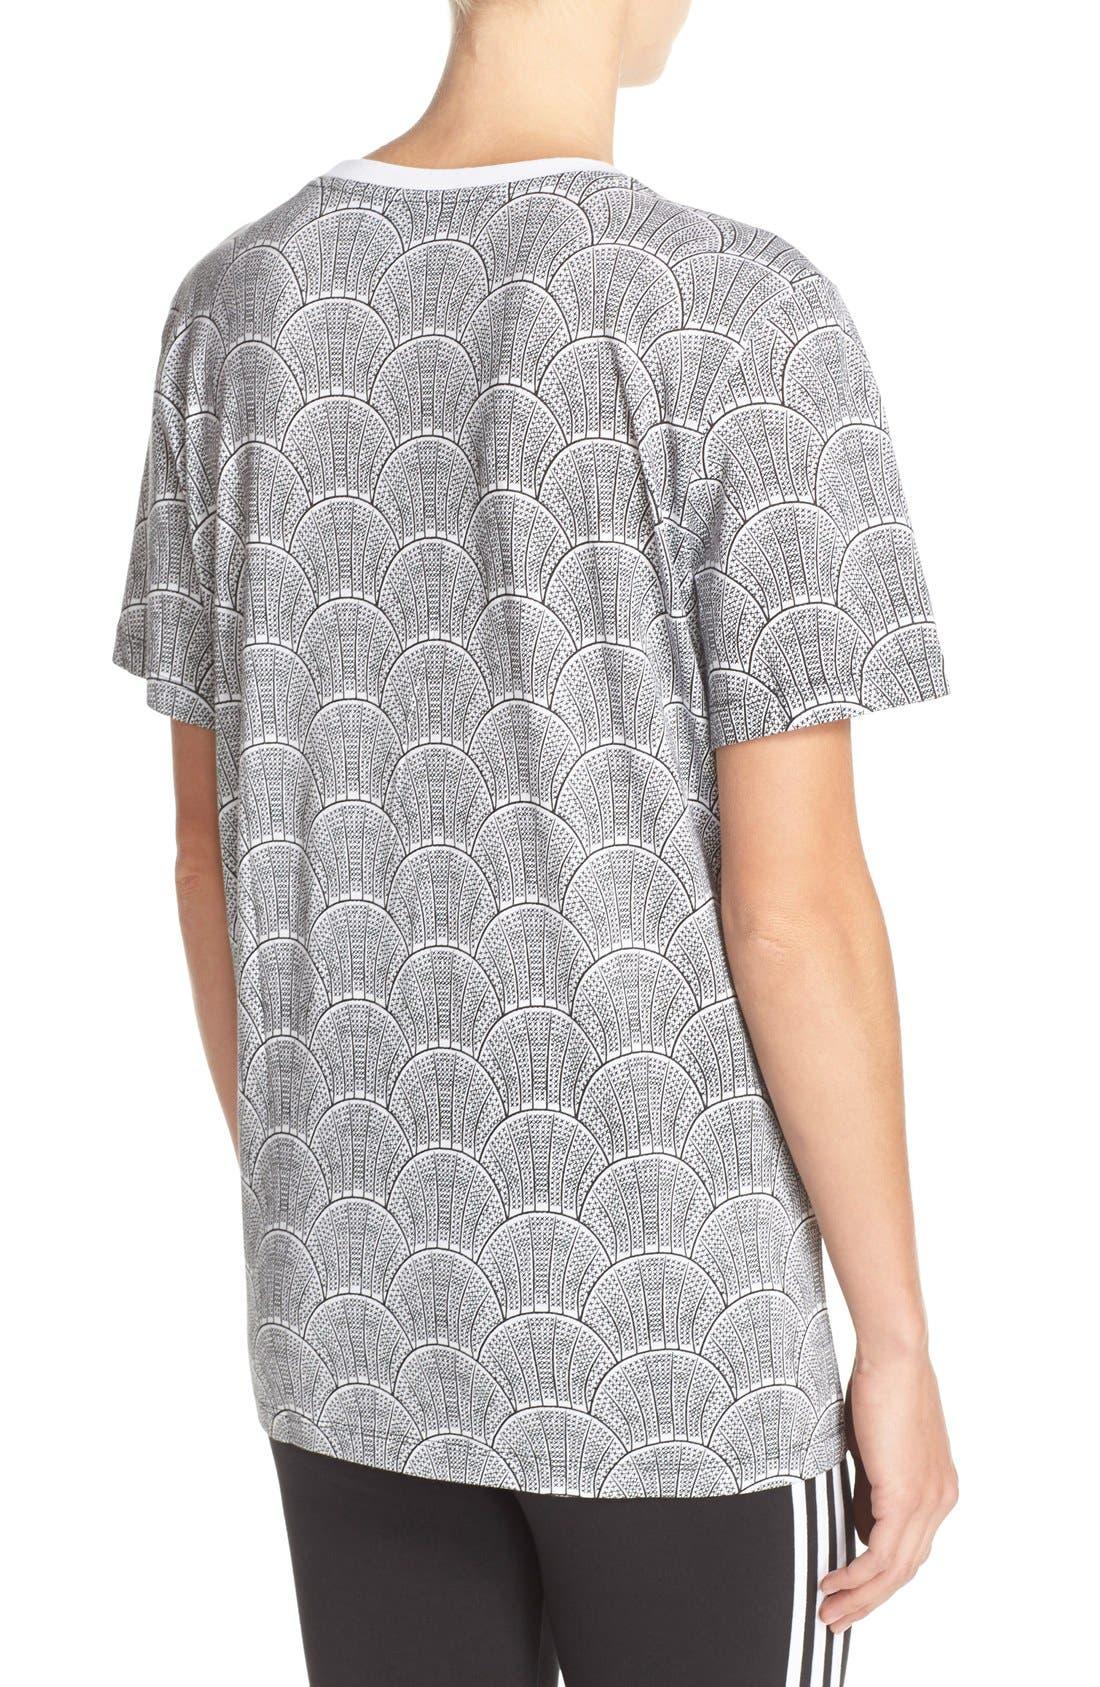 Alternate Image 2  - adidas Originals 'Shell Tile' Boyfriend Tee